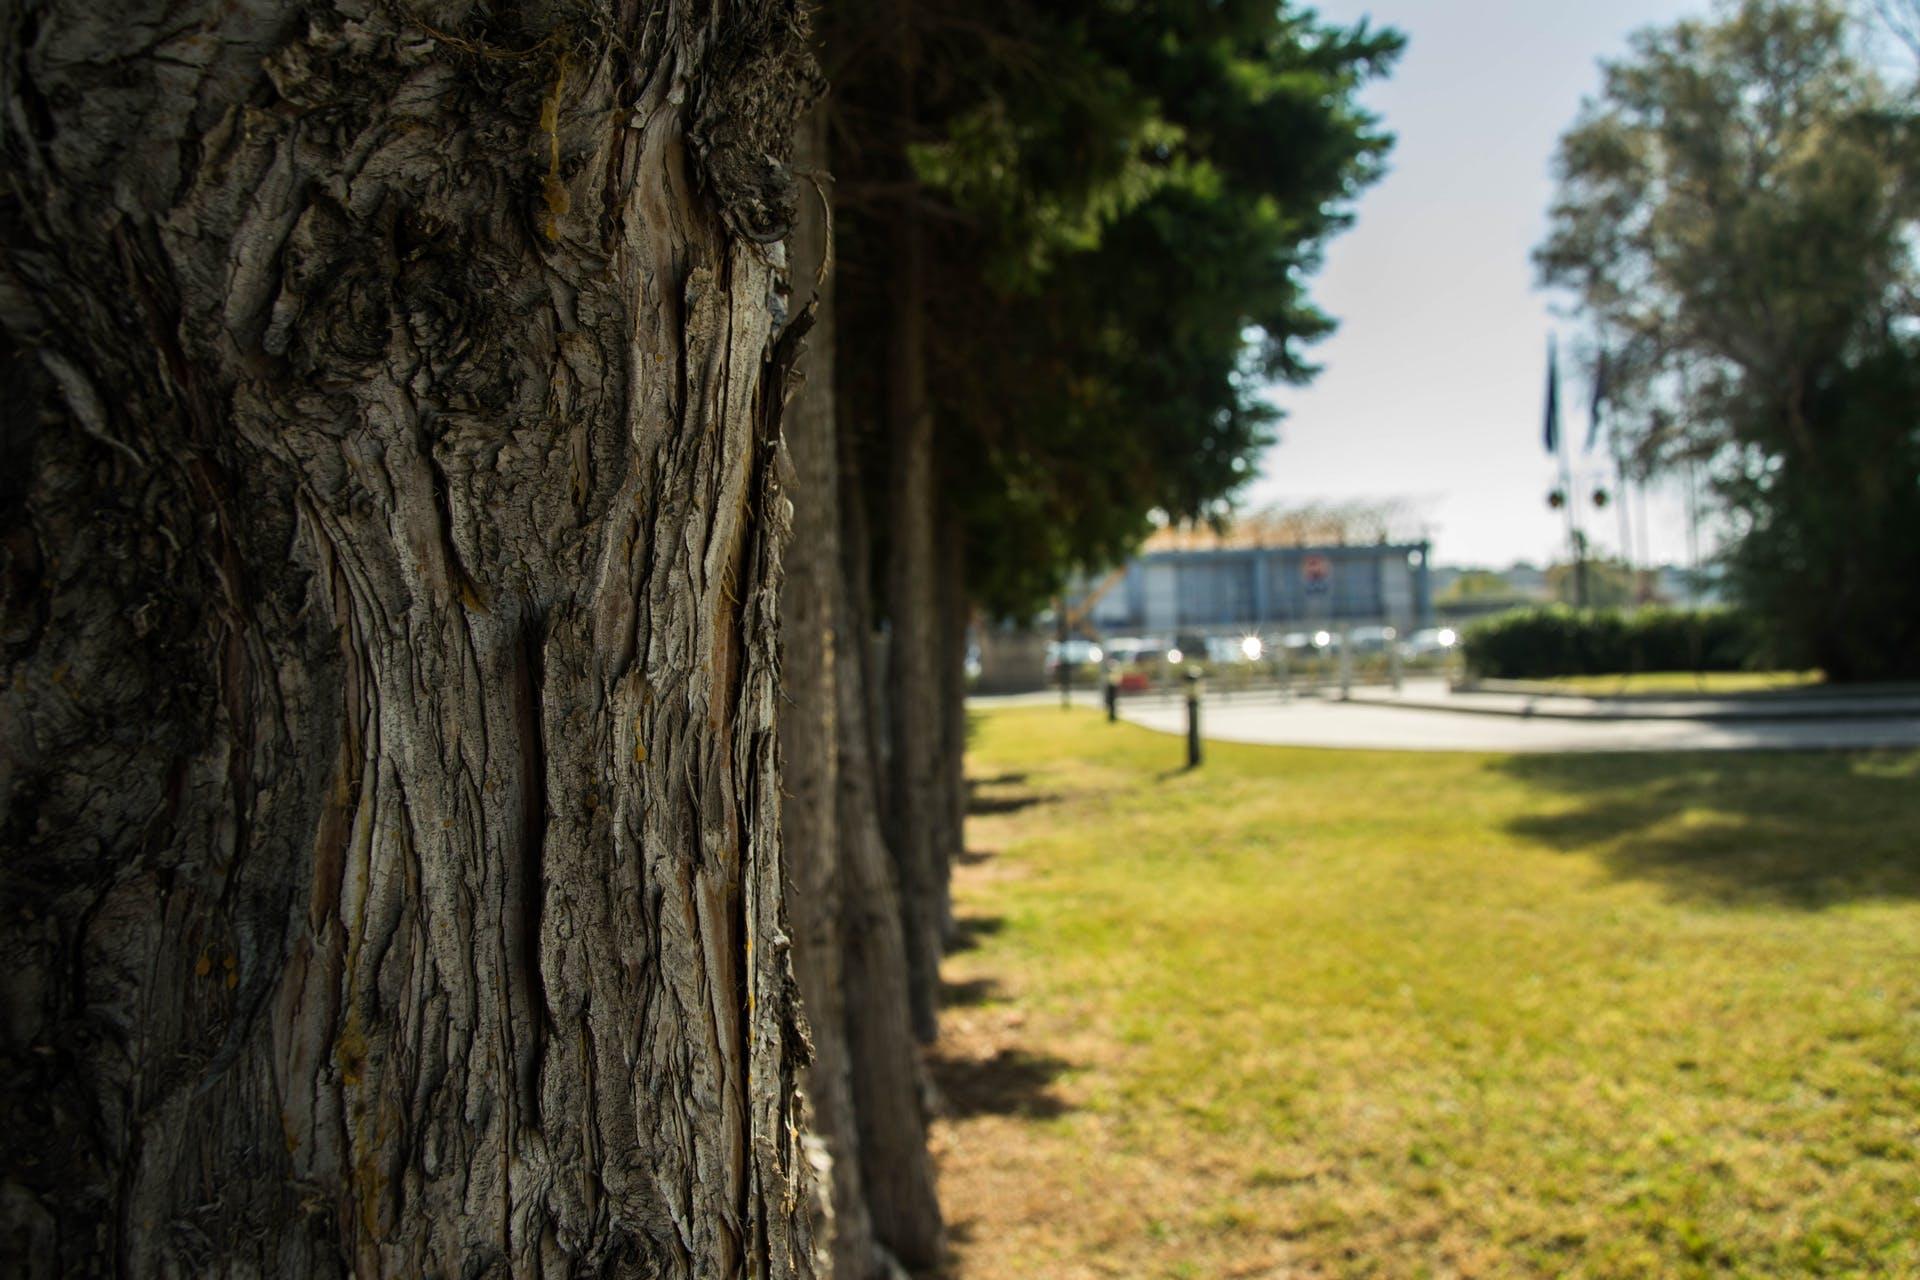 Grass Trees Sunny Day - WallDevil